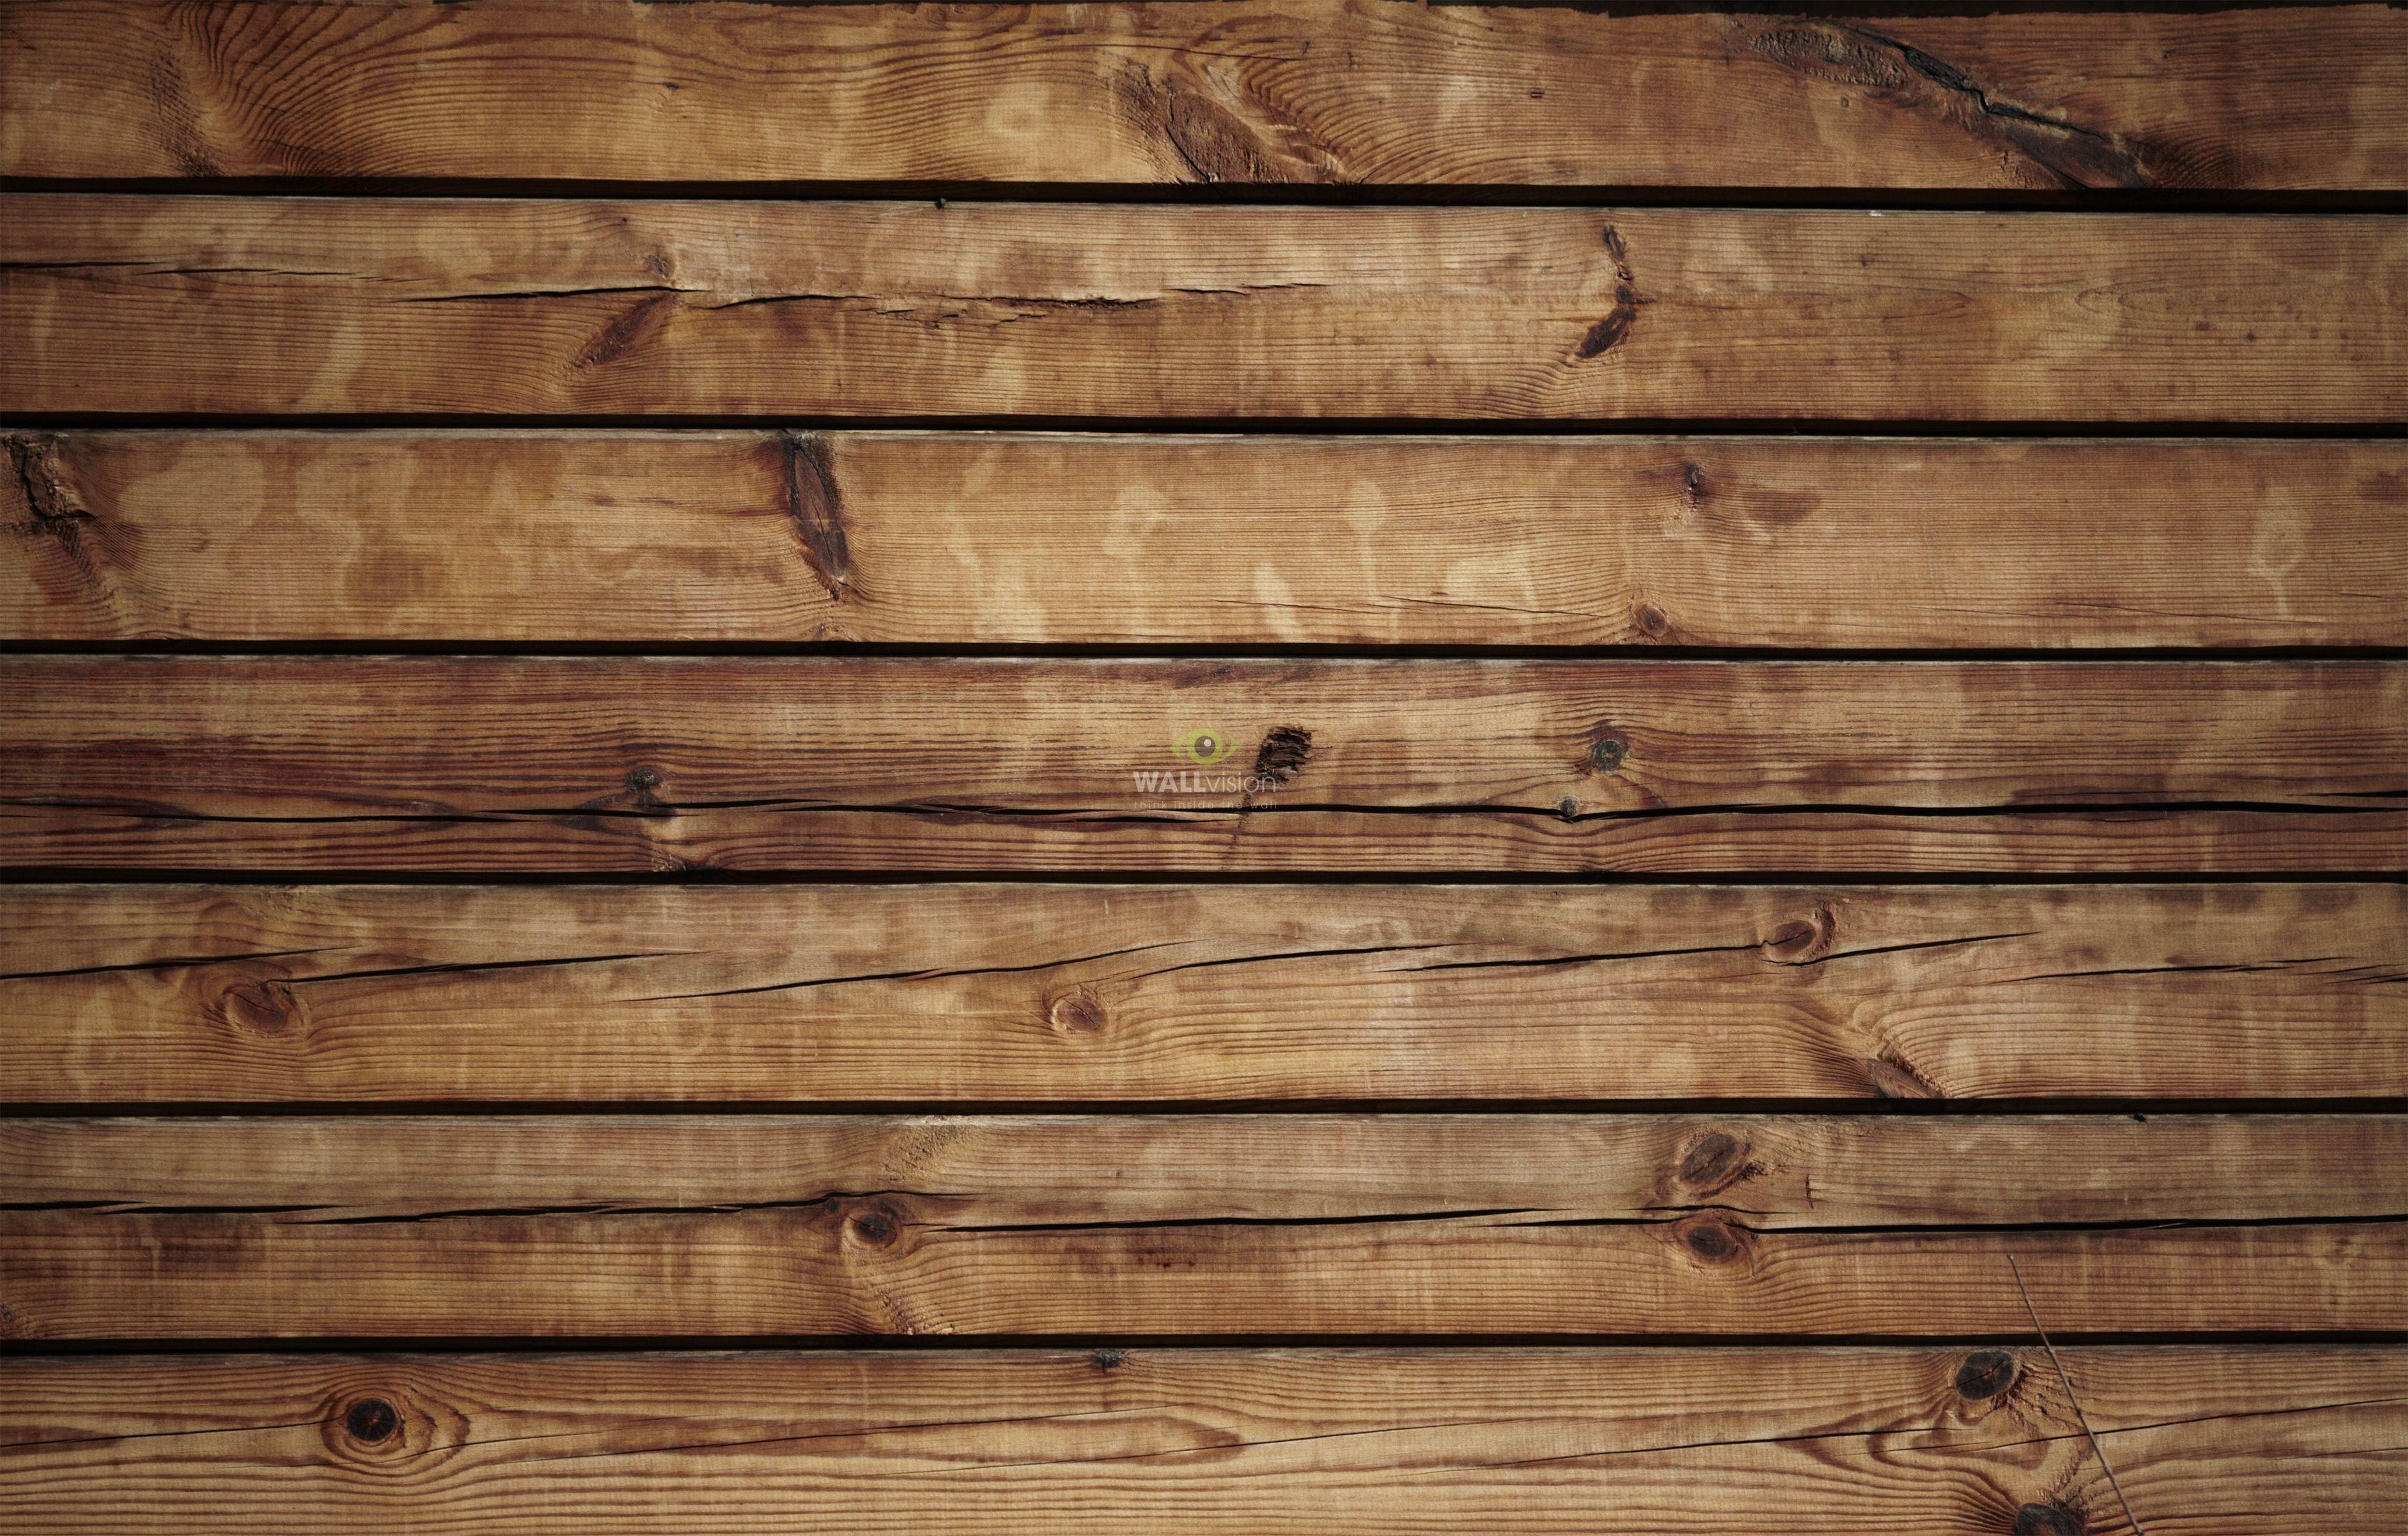 Vintage Wood Texture Madeira Disenos De Unas Diseno Grafico Tipografia